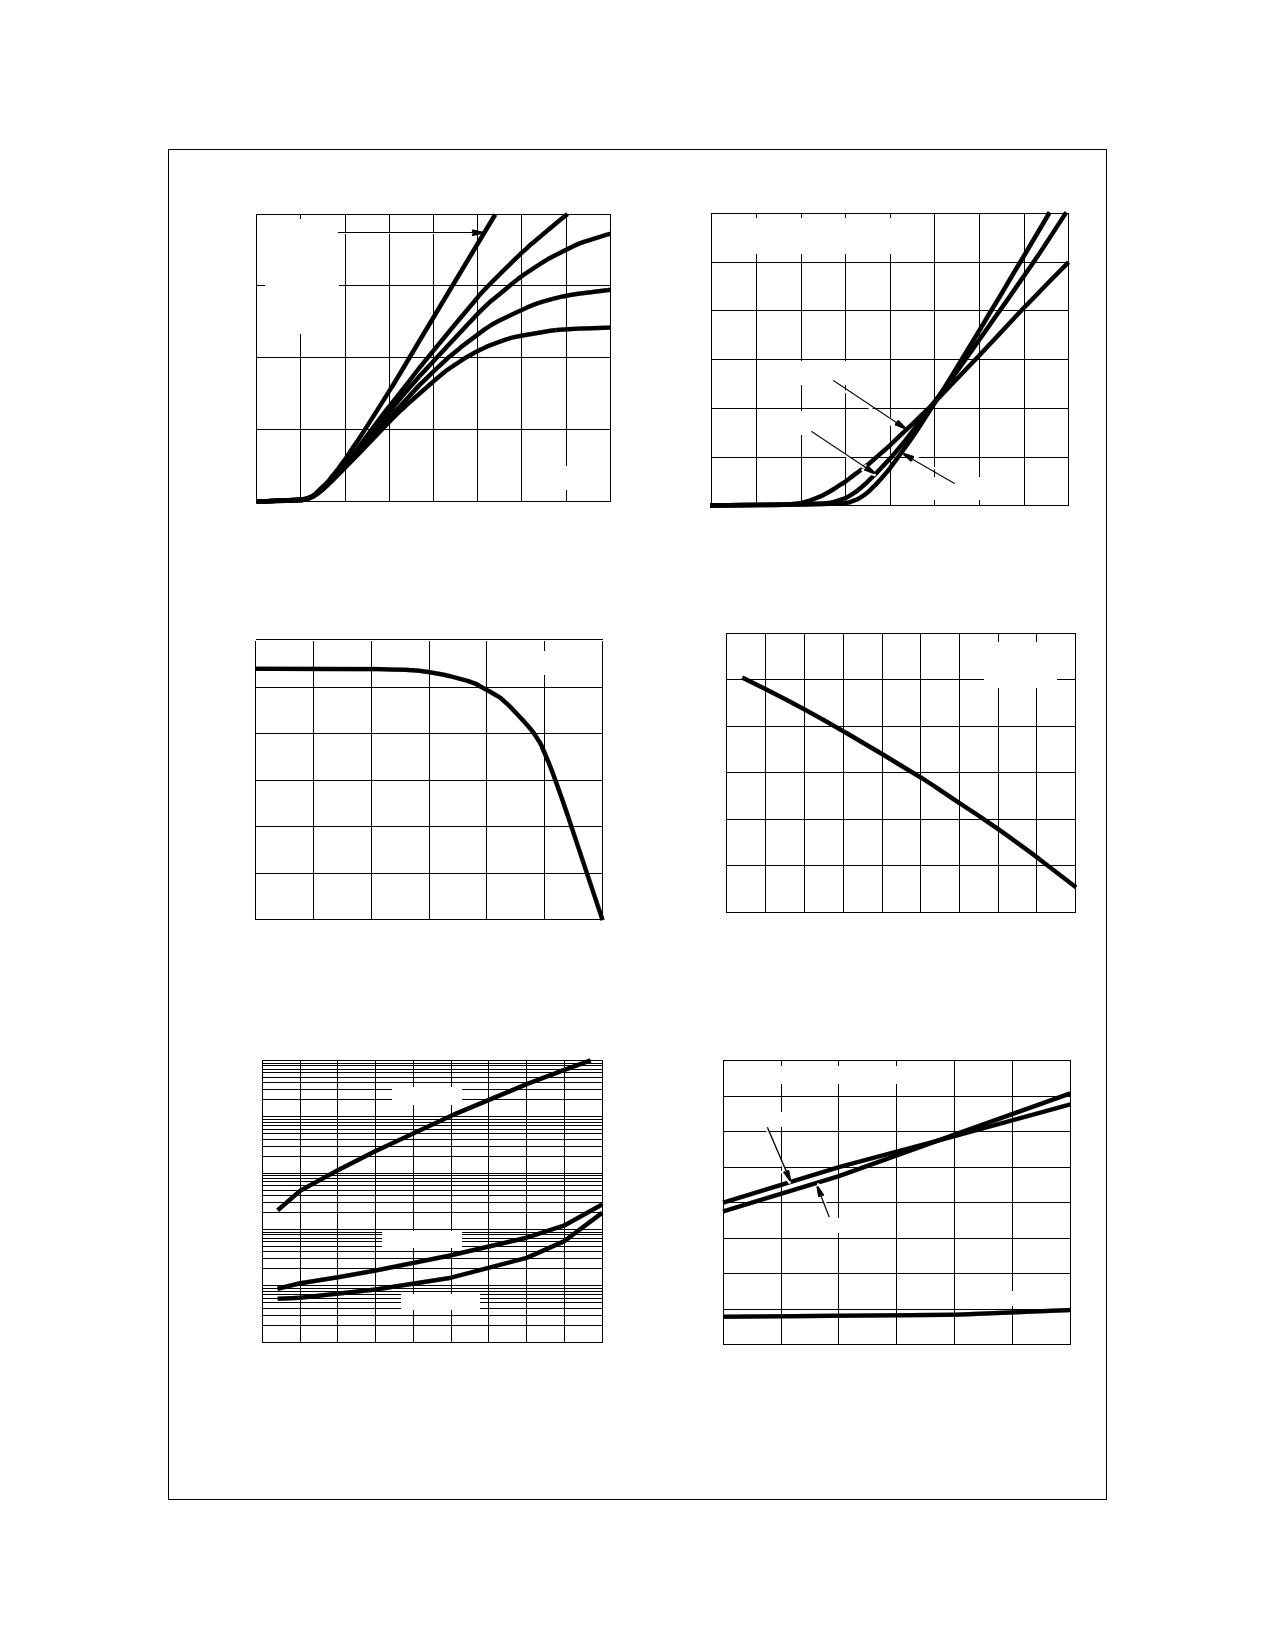 ISL9V2040D3S pdf, 반도체, 판매, 대치품